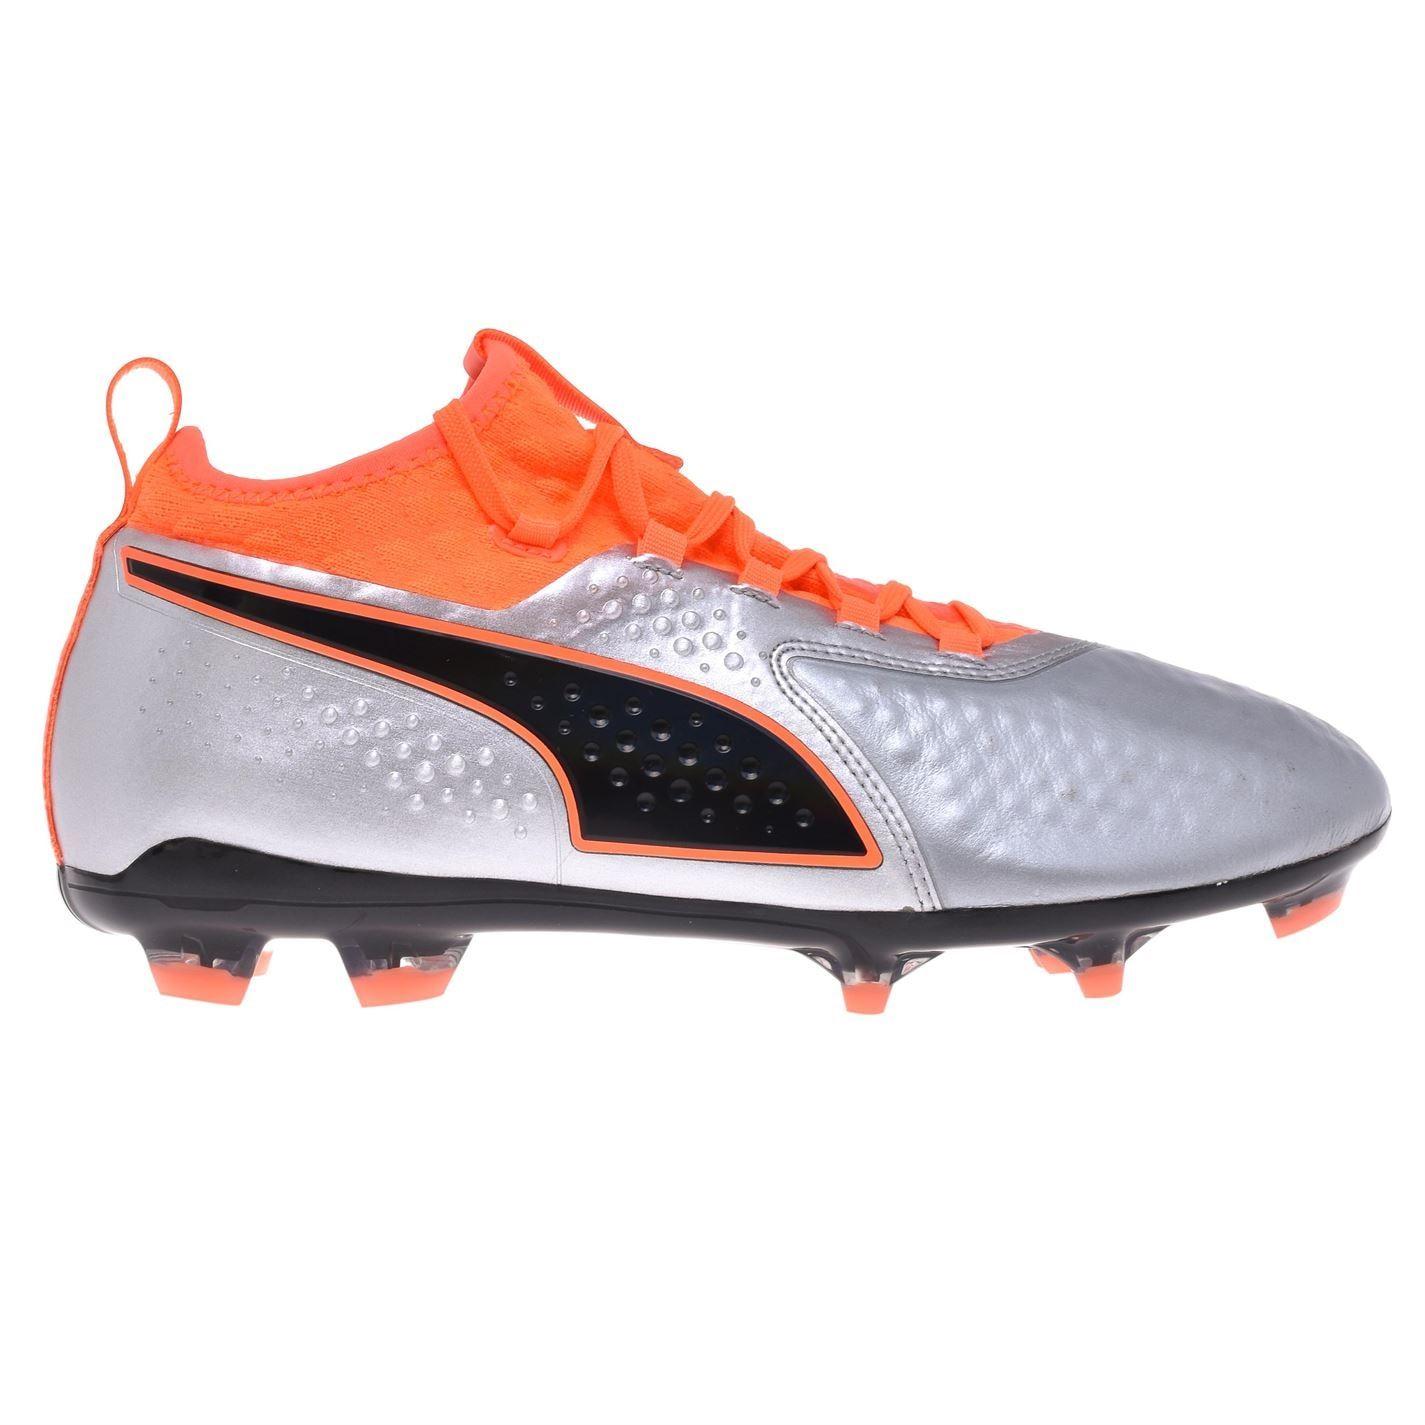 miniature 9 - Puma-One-2-Cuir-engins-fixes-Terre-Ferme-Chaussures-De-Football-Homme-Chaussures-de-foot-crampons